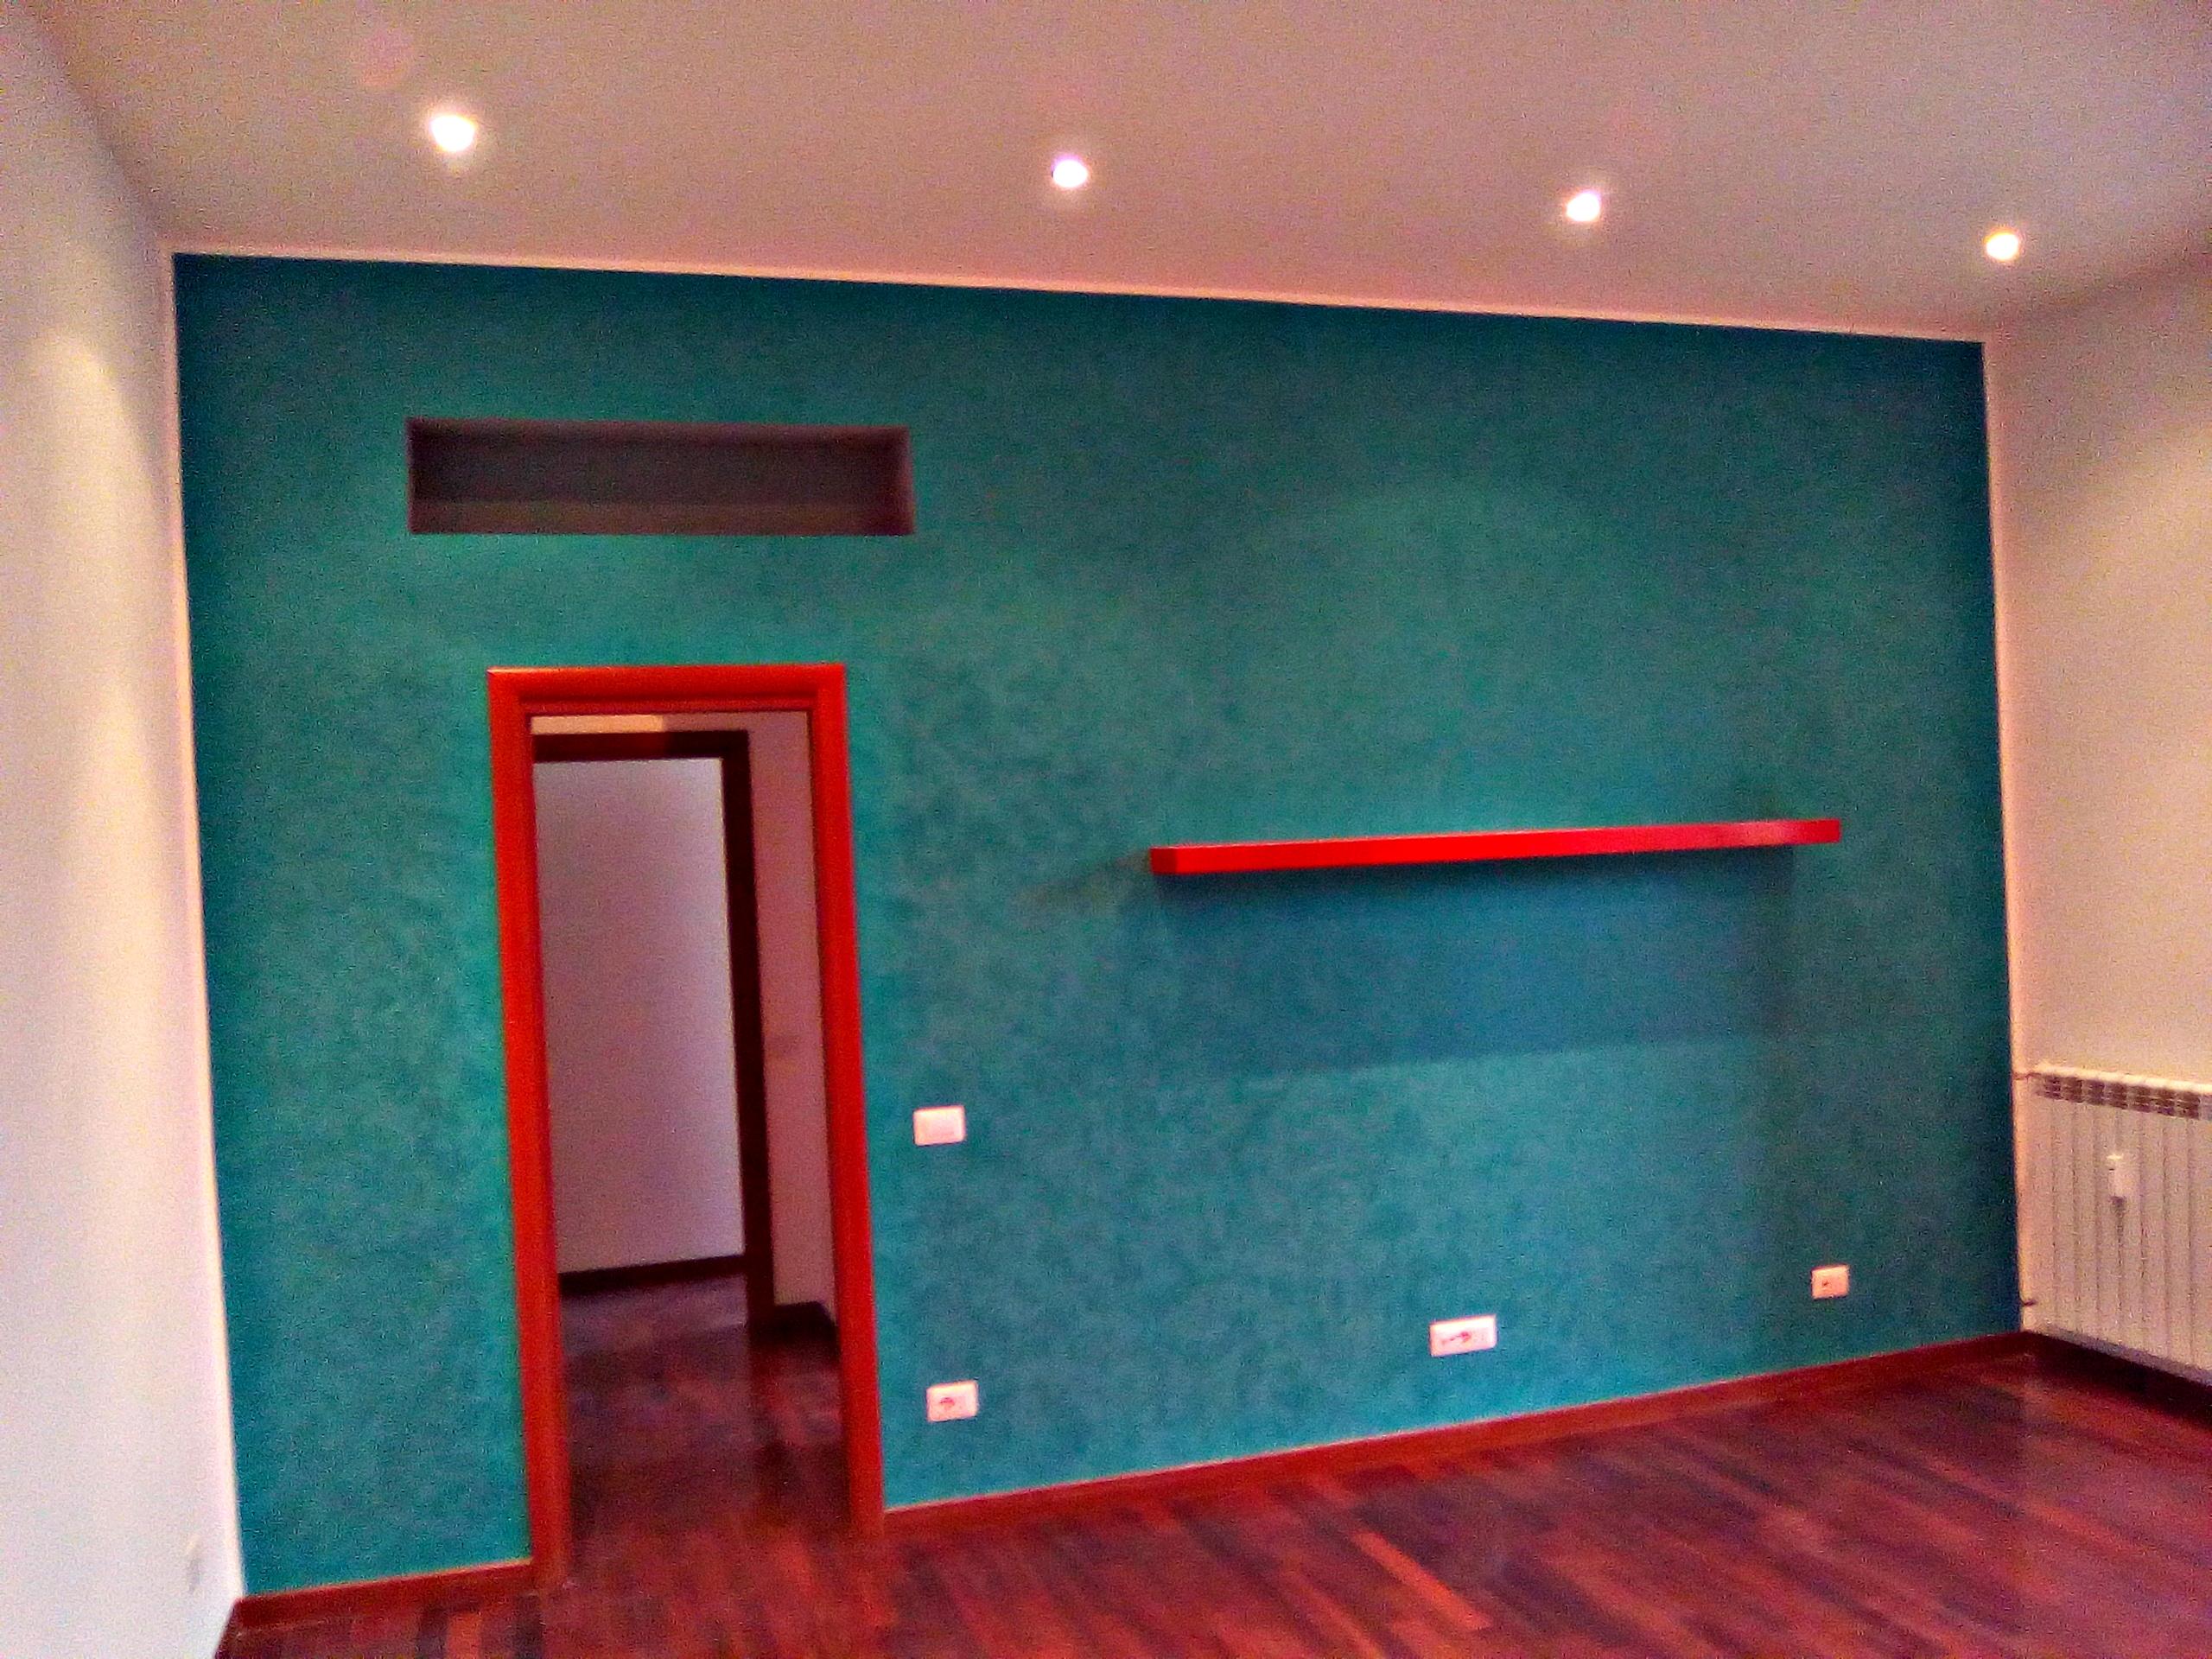 Pittura Per Interni Prezzi.Pittura Decorativa Tamponato Pittura Decorativa Per Interni Ad